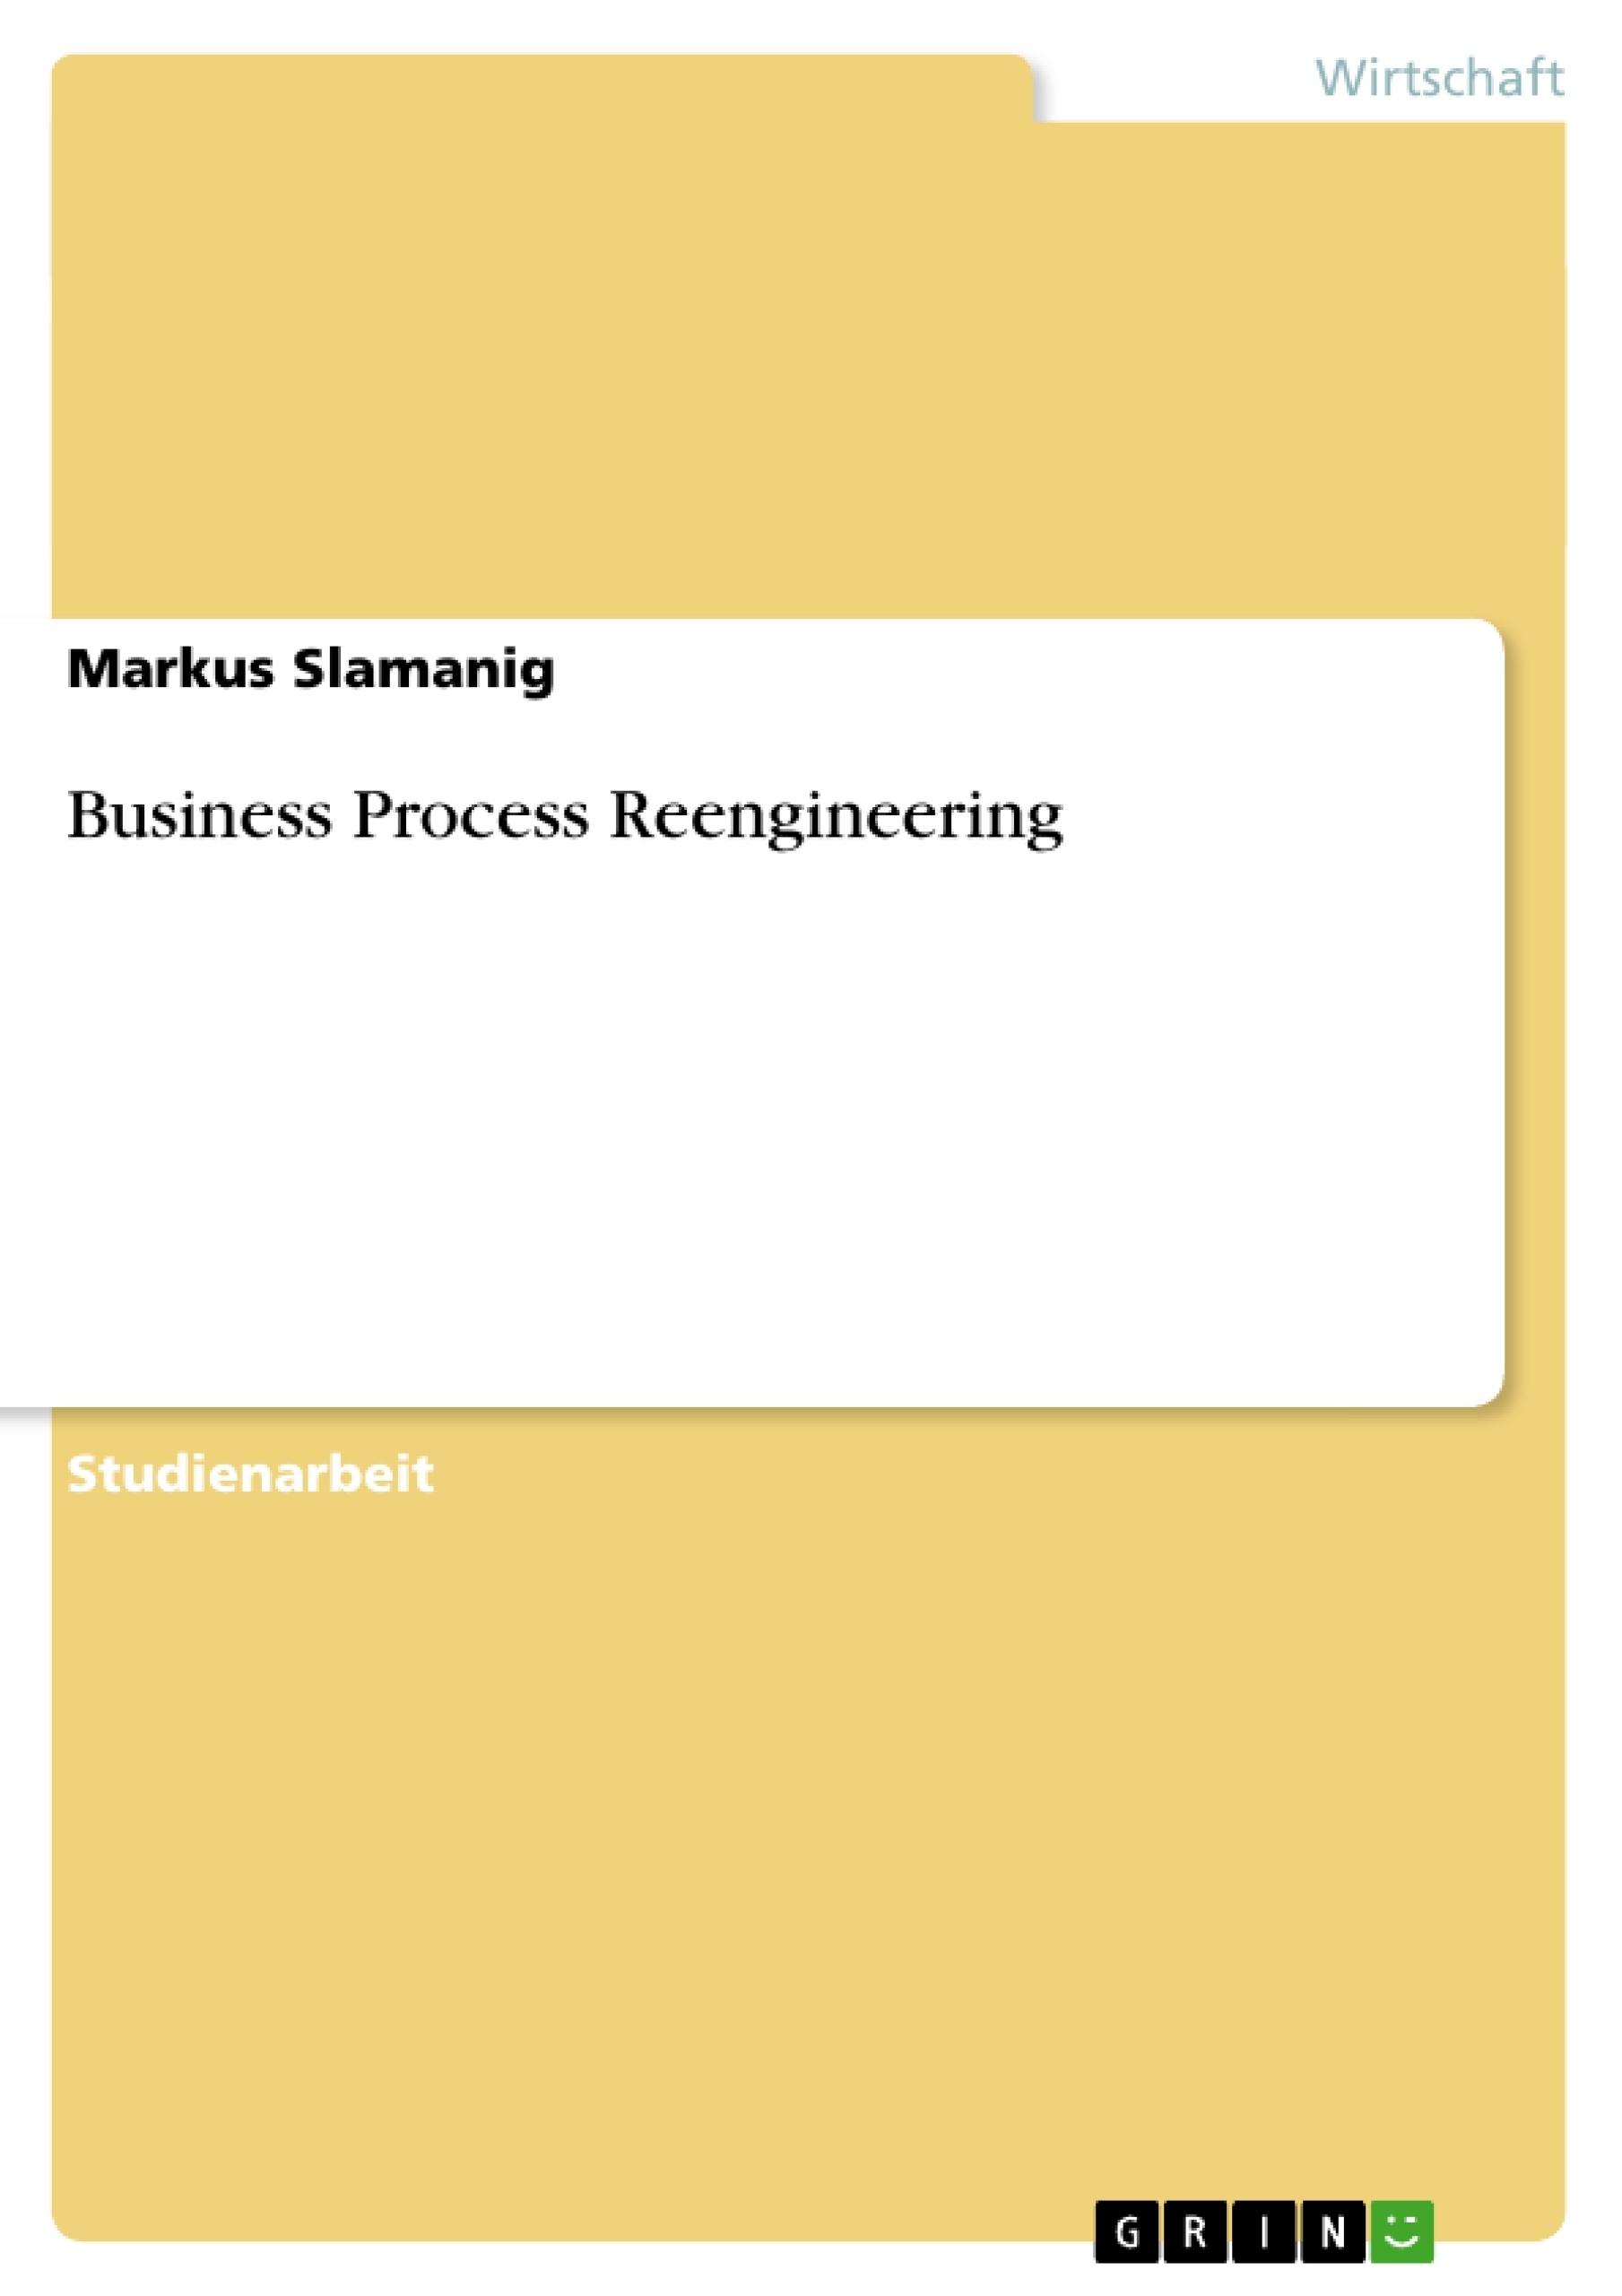 Titel: Business Process Reengineering